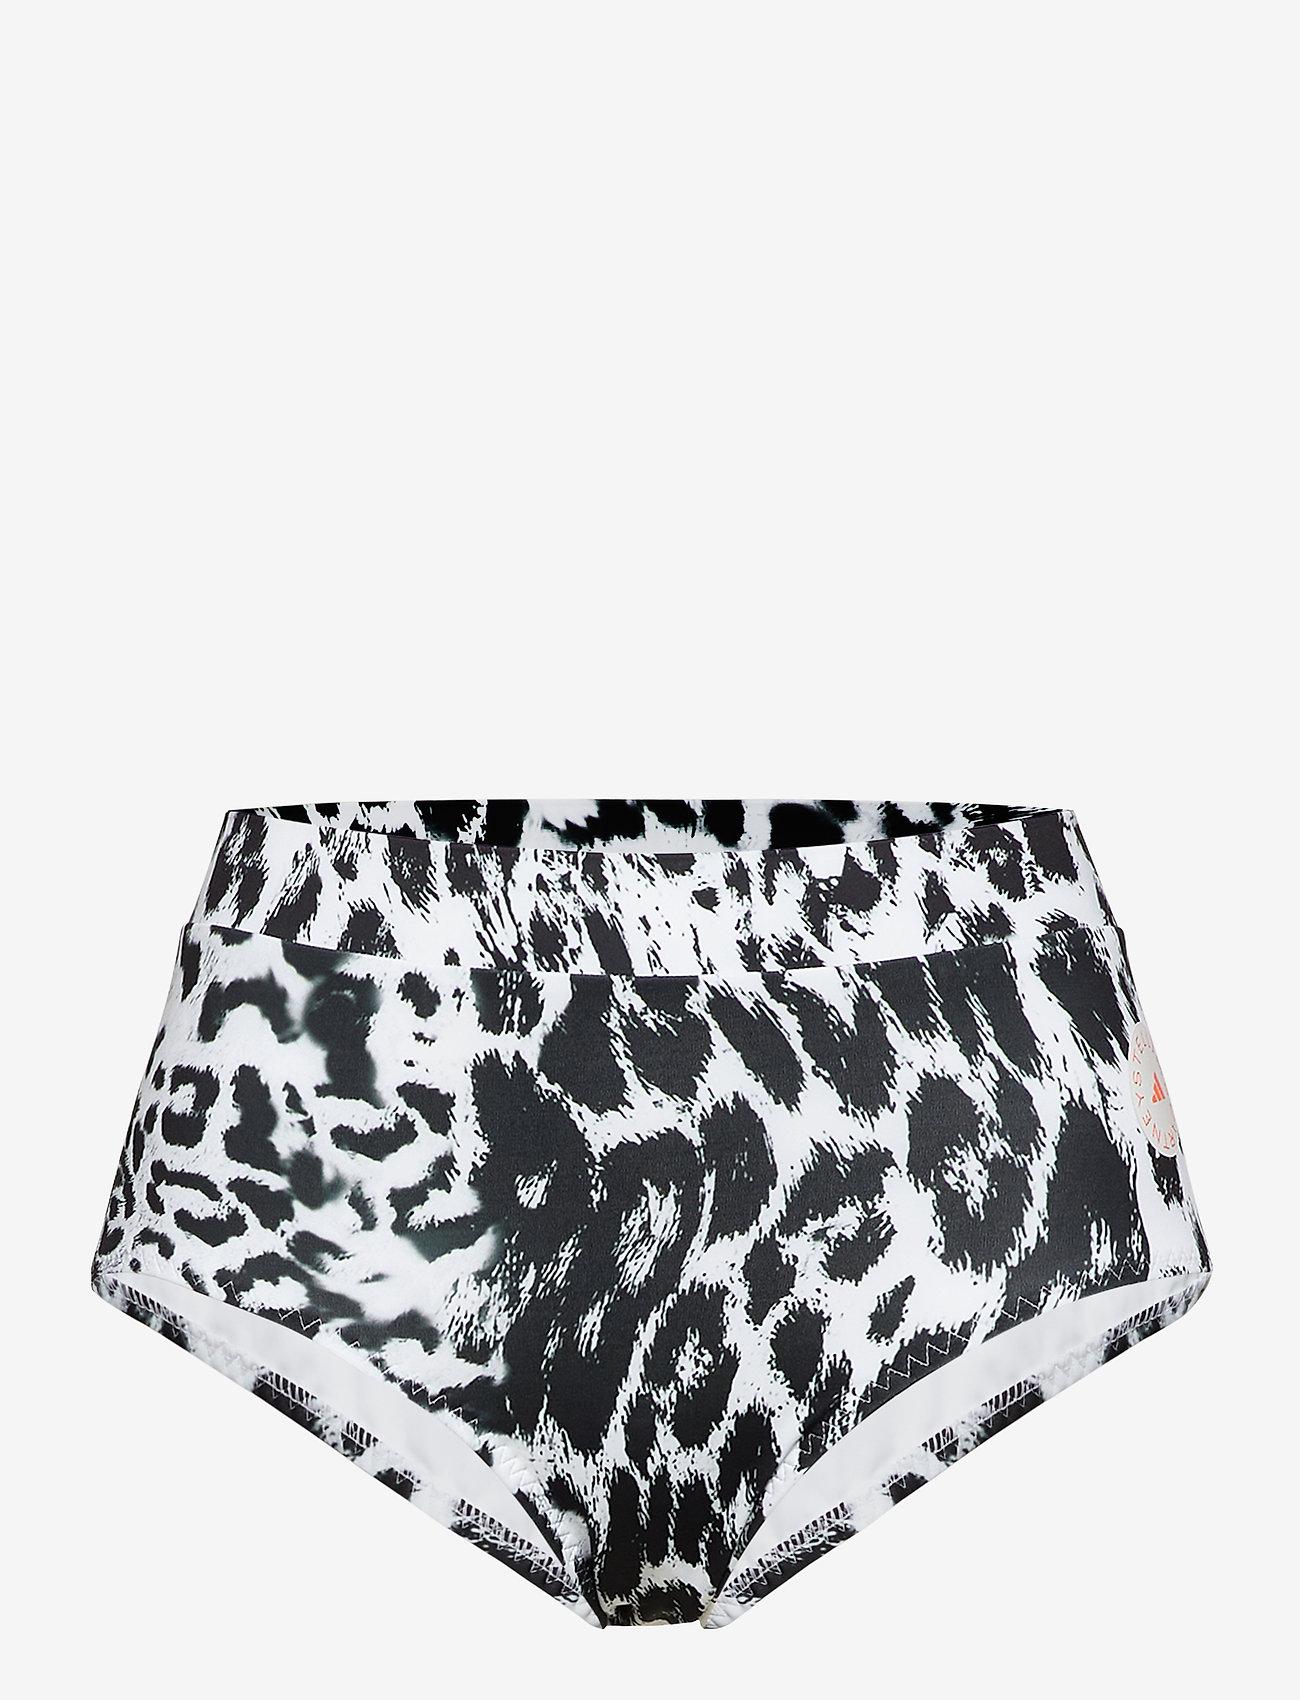 adidas by Stella McCartney - TRUEPUR BIKINIB - bikinitrosor - white/black - 1